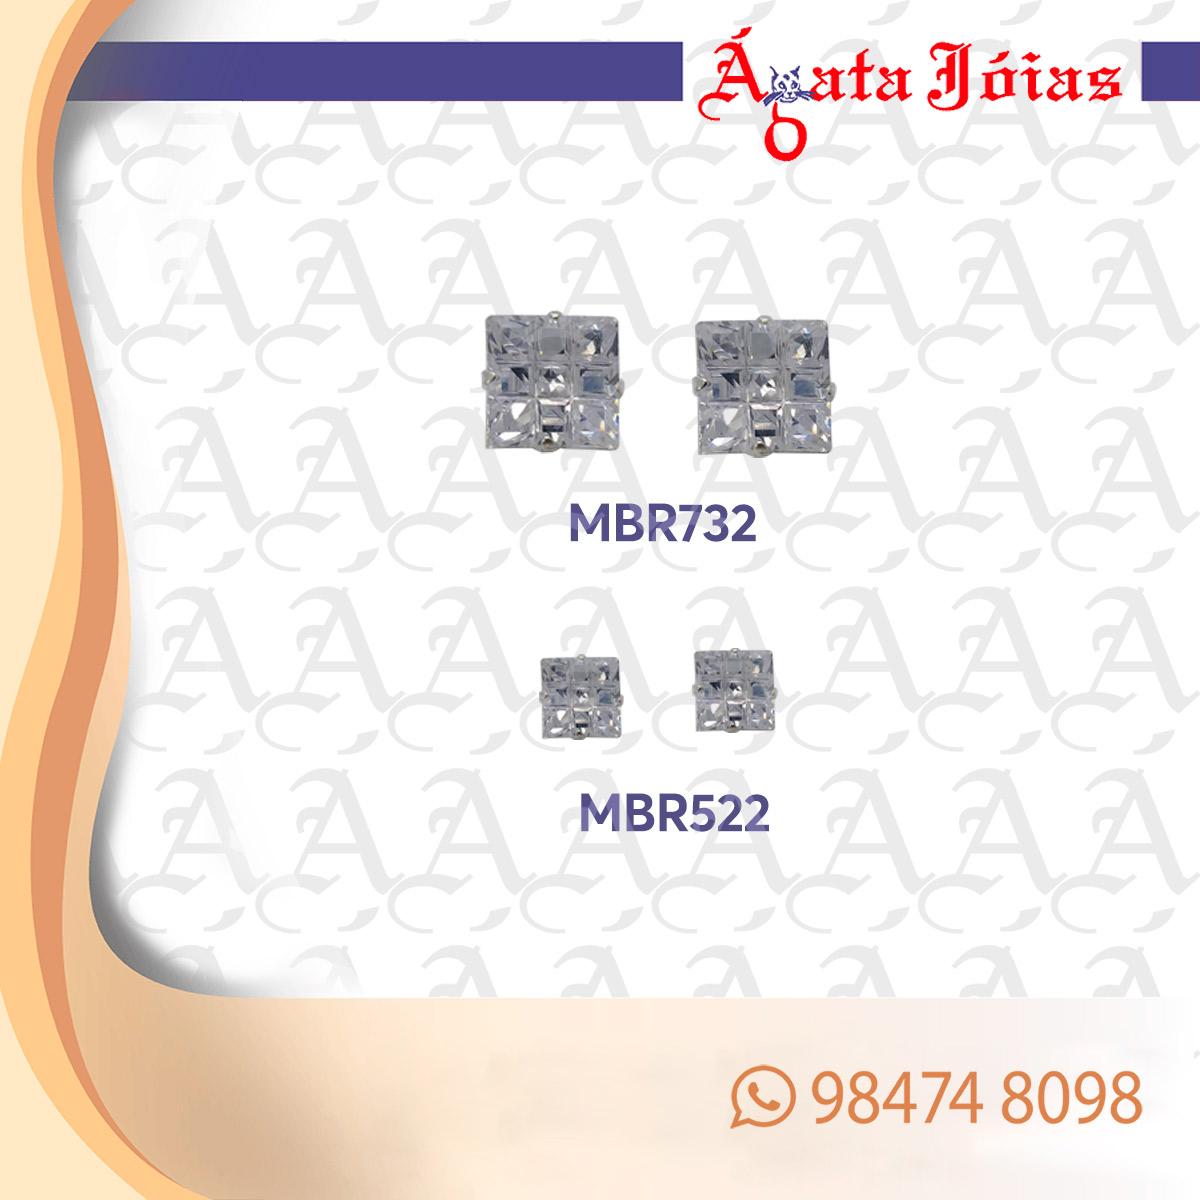 MBR732